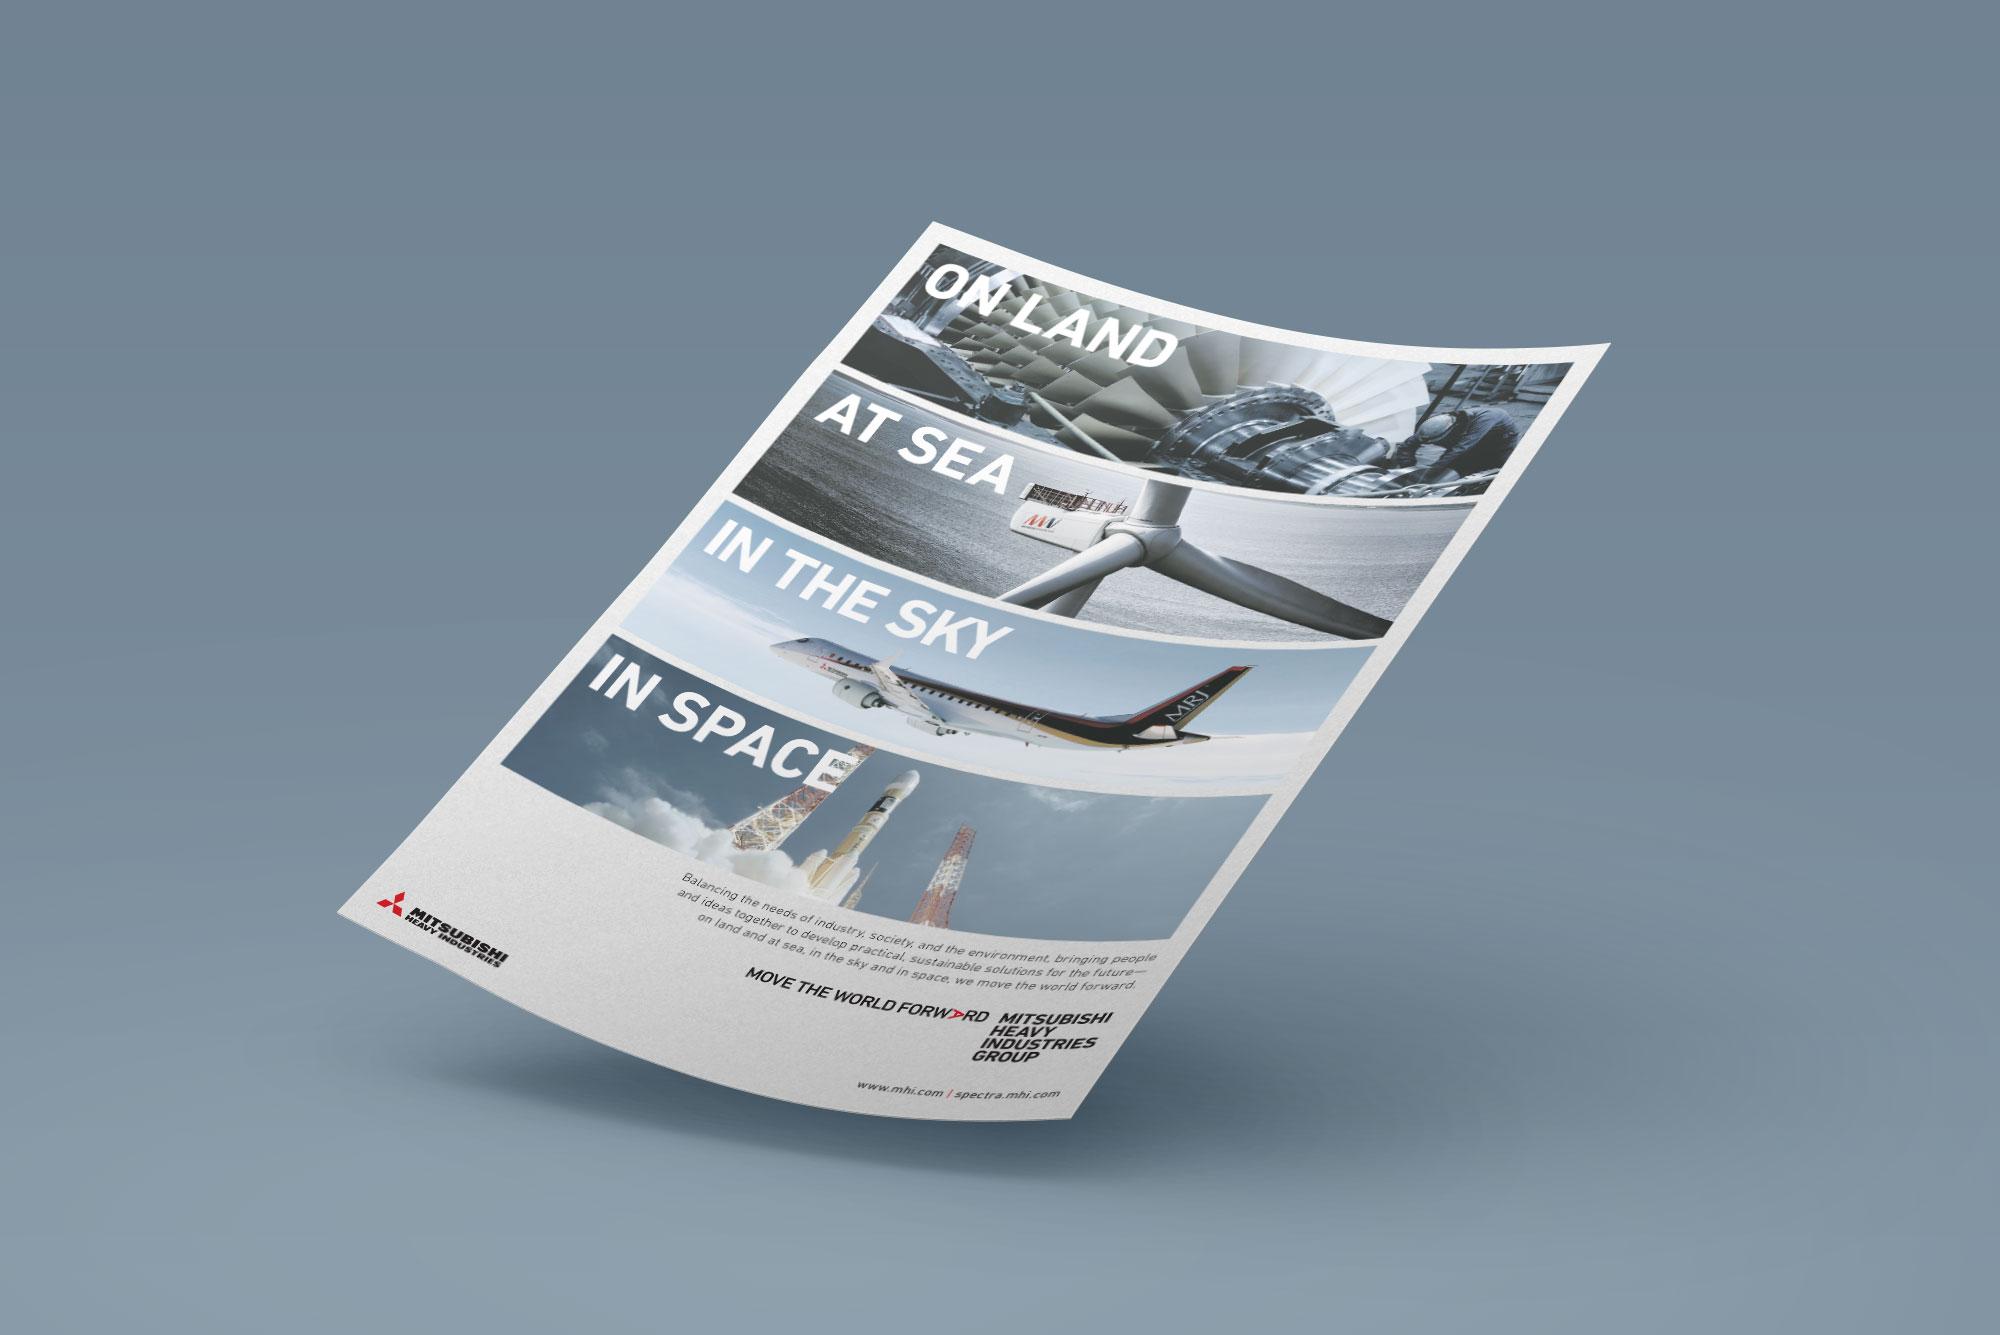 Mitsubishi Group advertisement on floating page